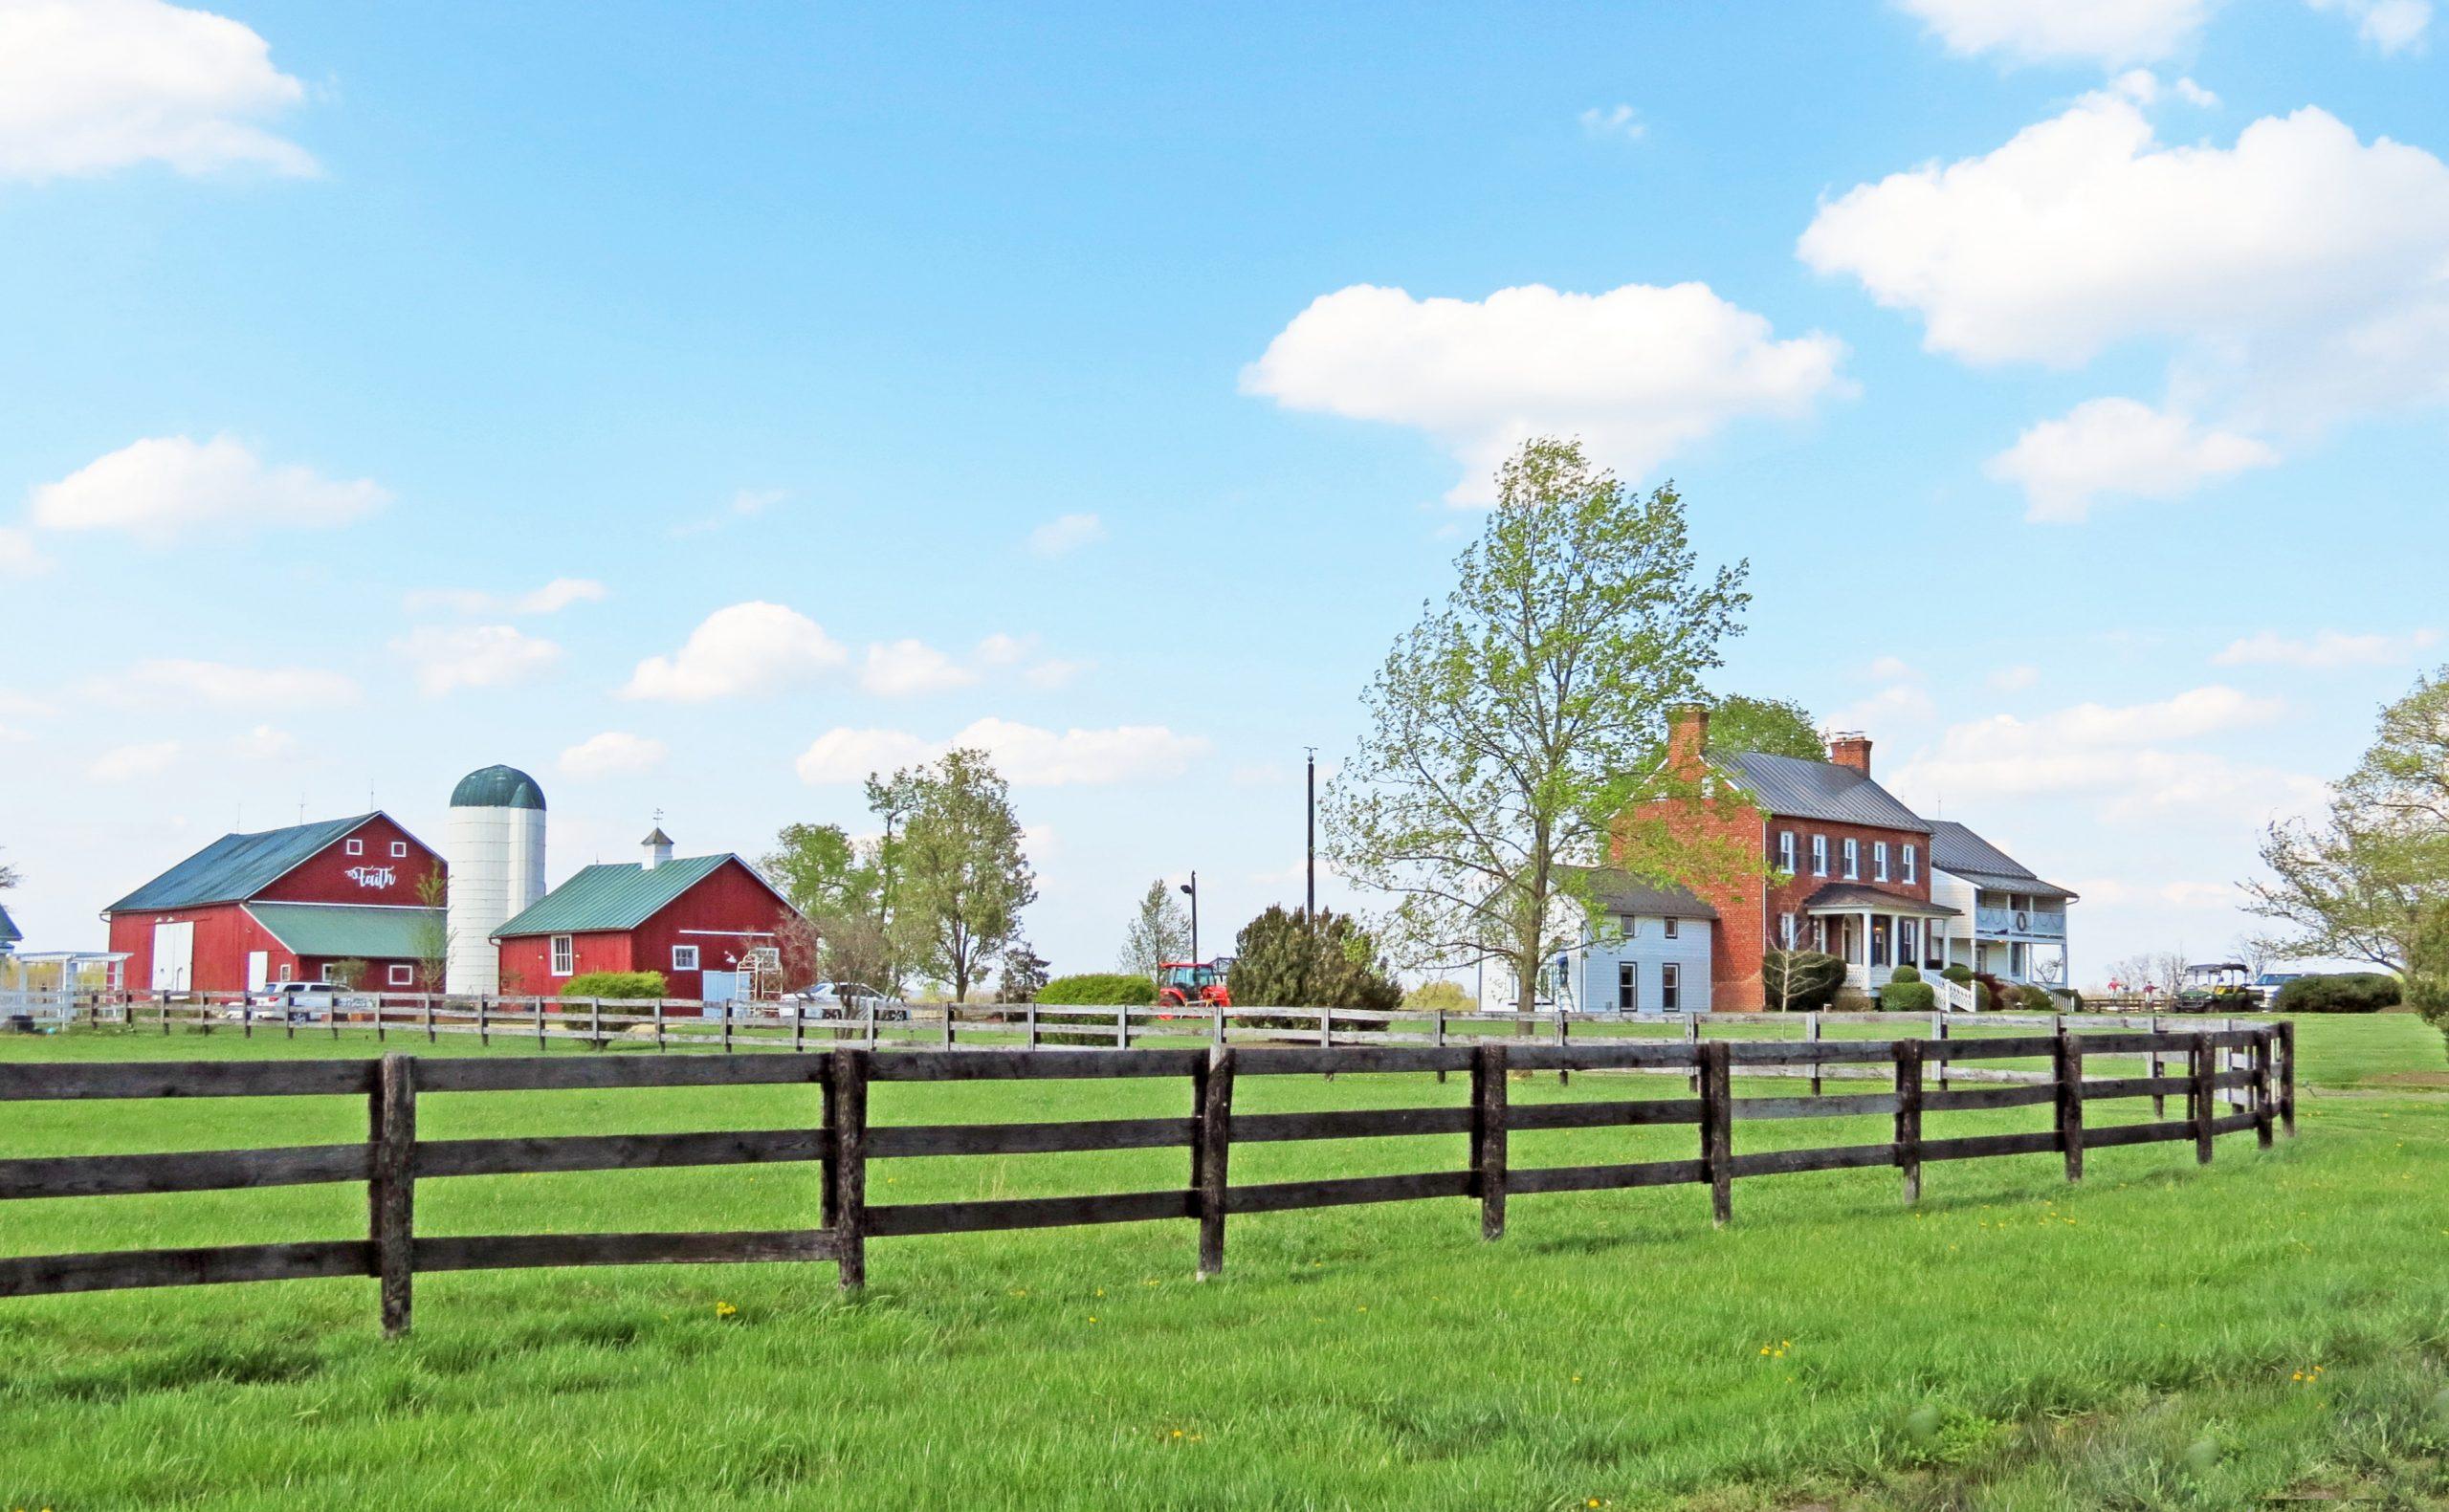 Catoctin Rural Historic District